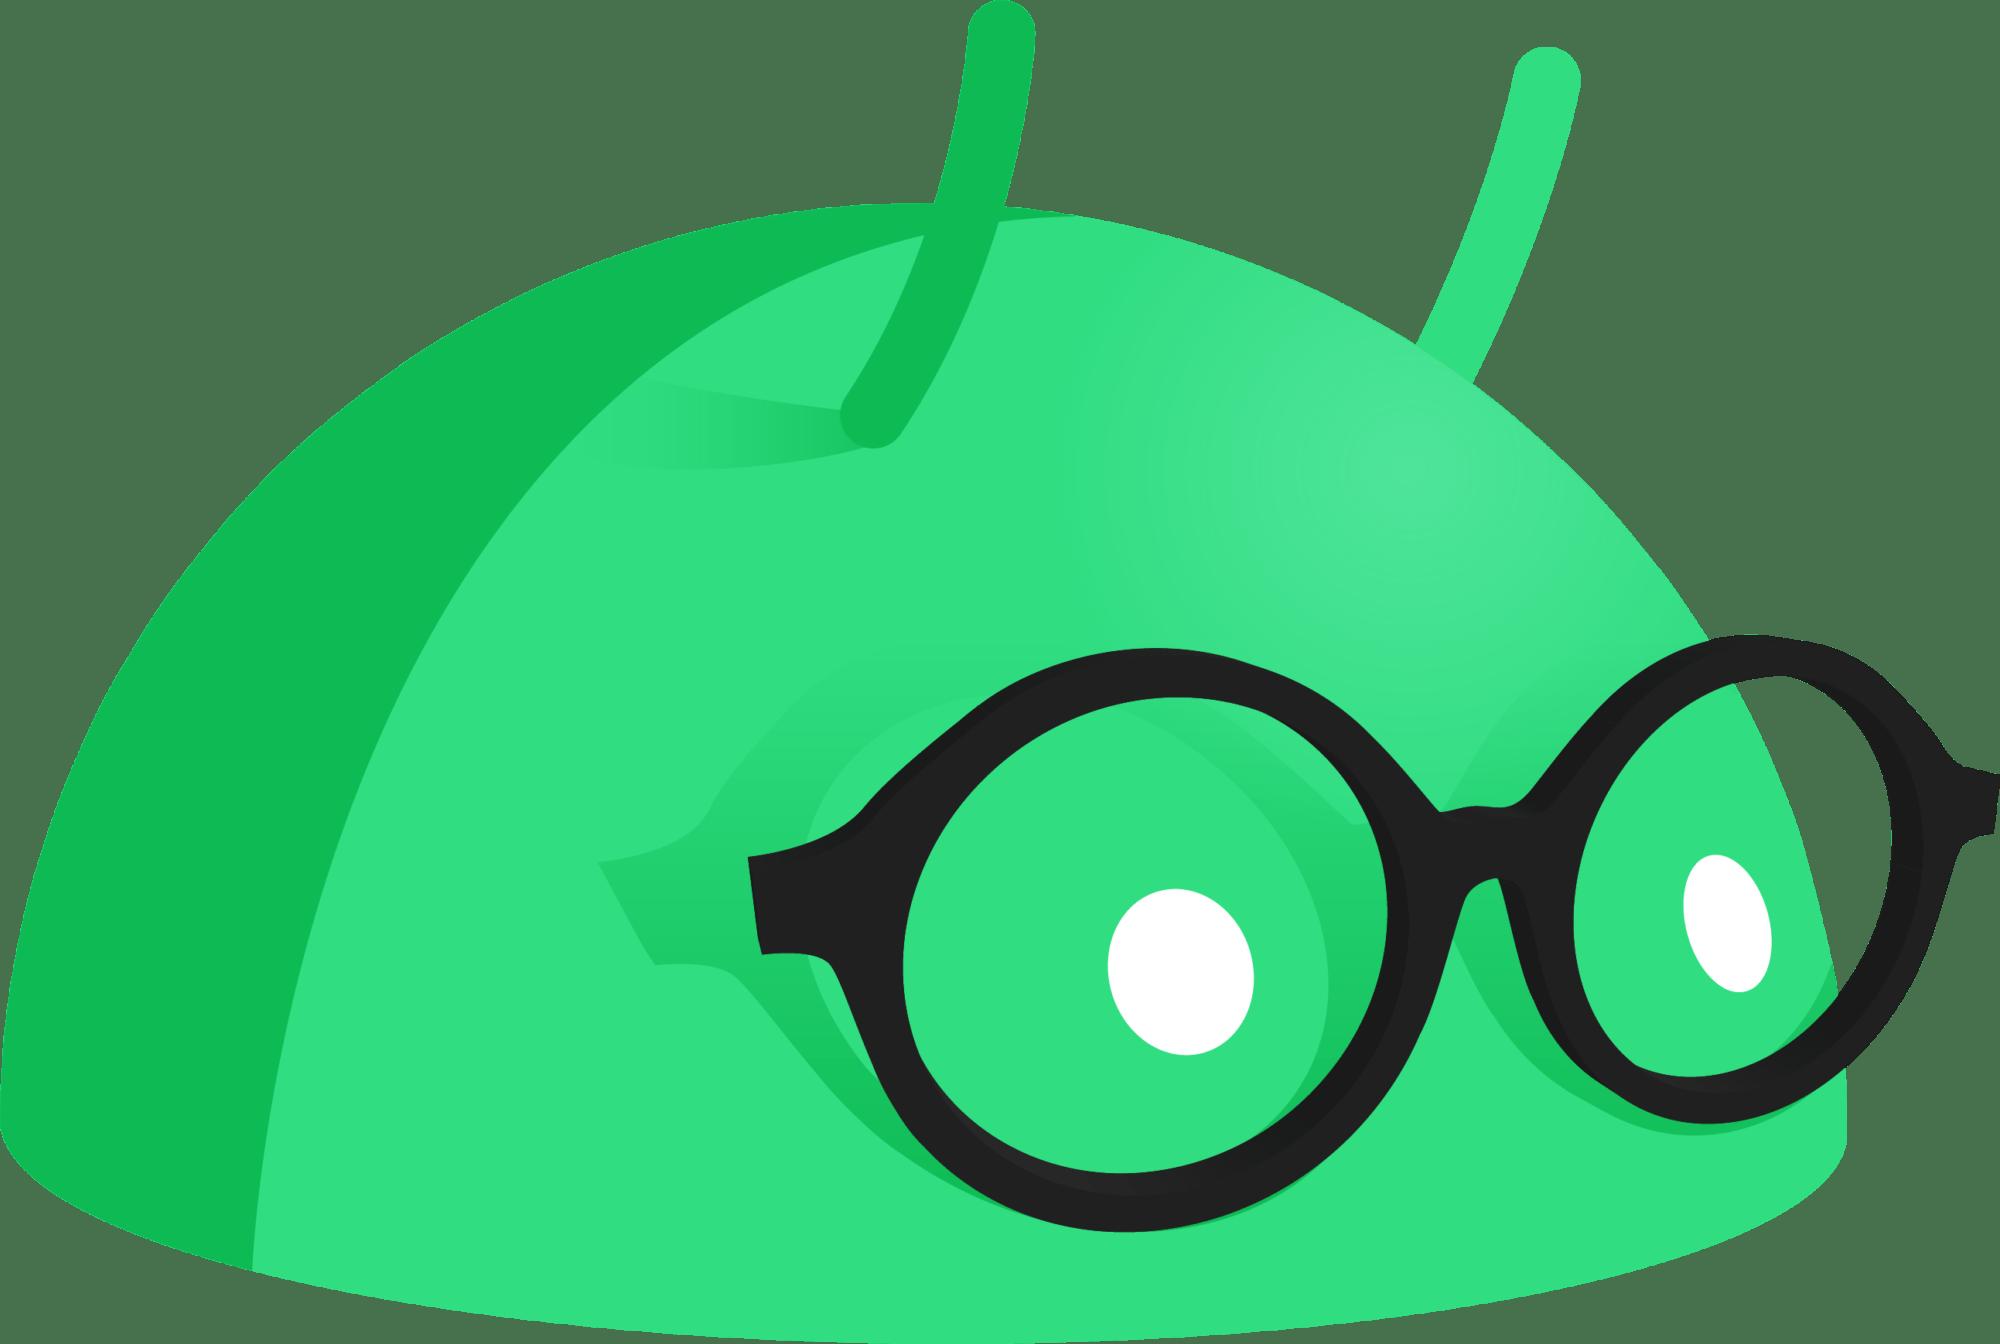 logo droidqoft